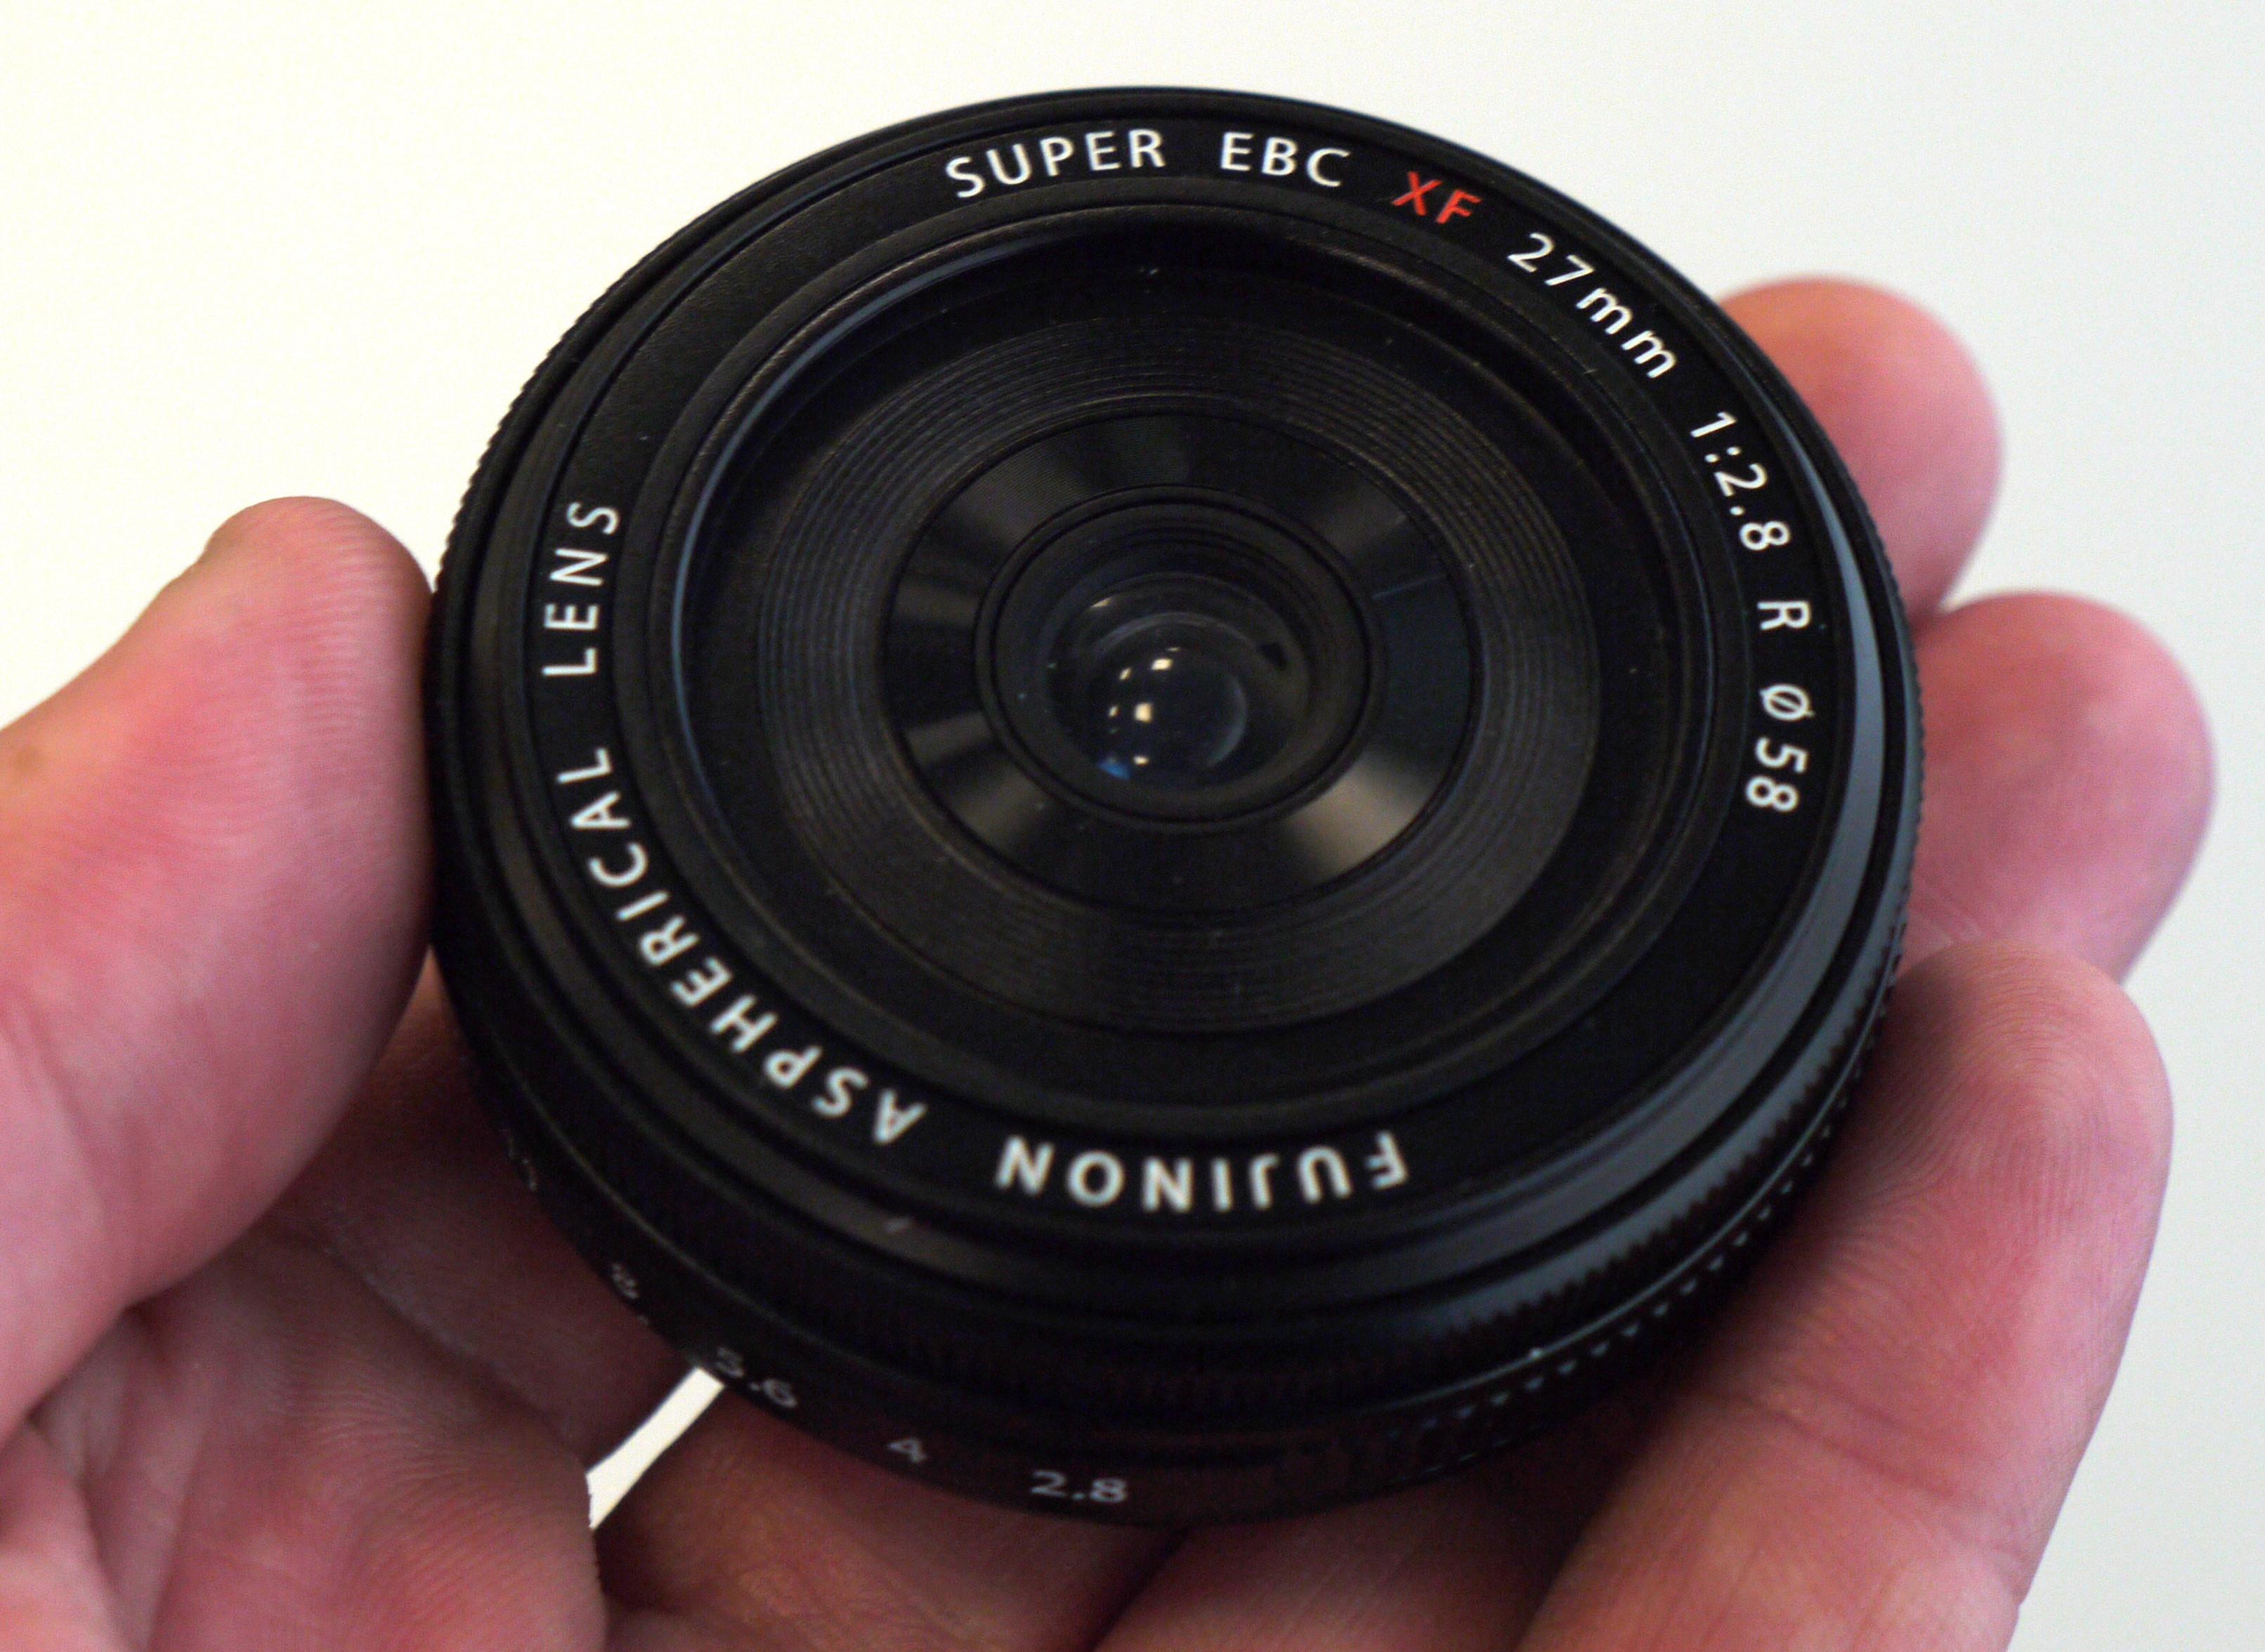 Fujifilm X 14mm 18-55mm 27mm Future Lenses Hands-On | ePHOTOzine